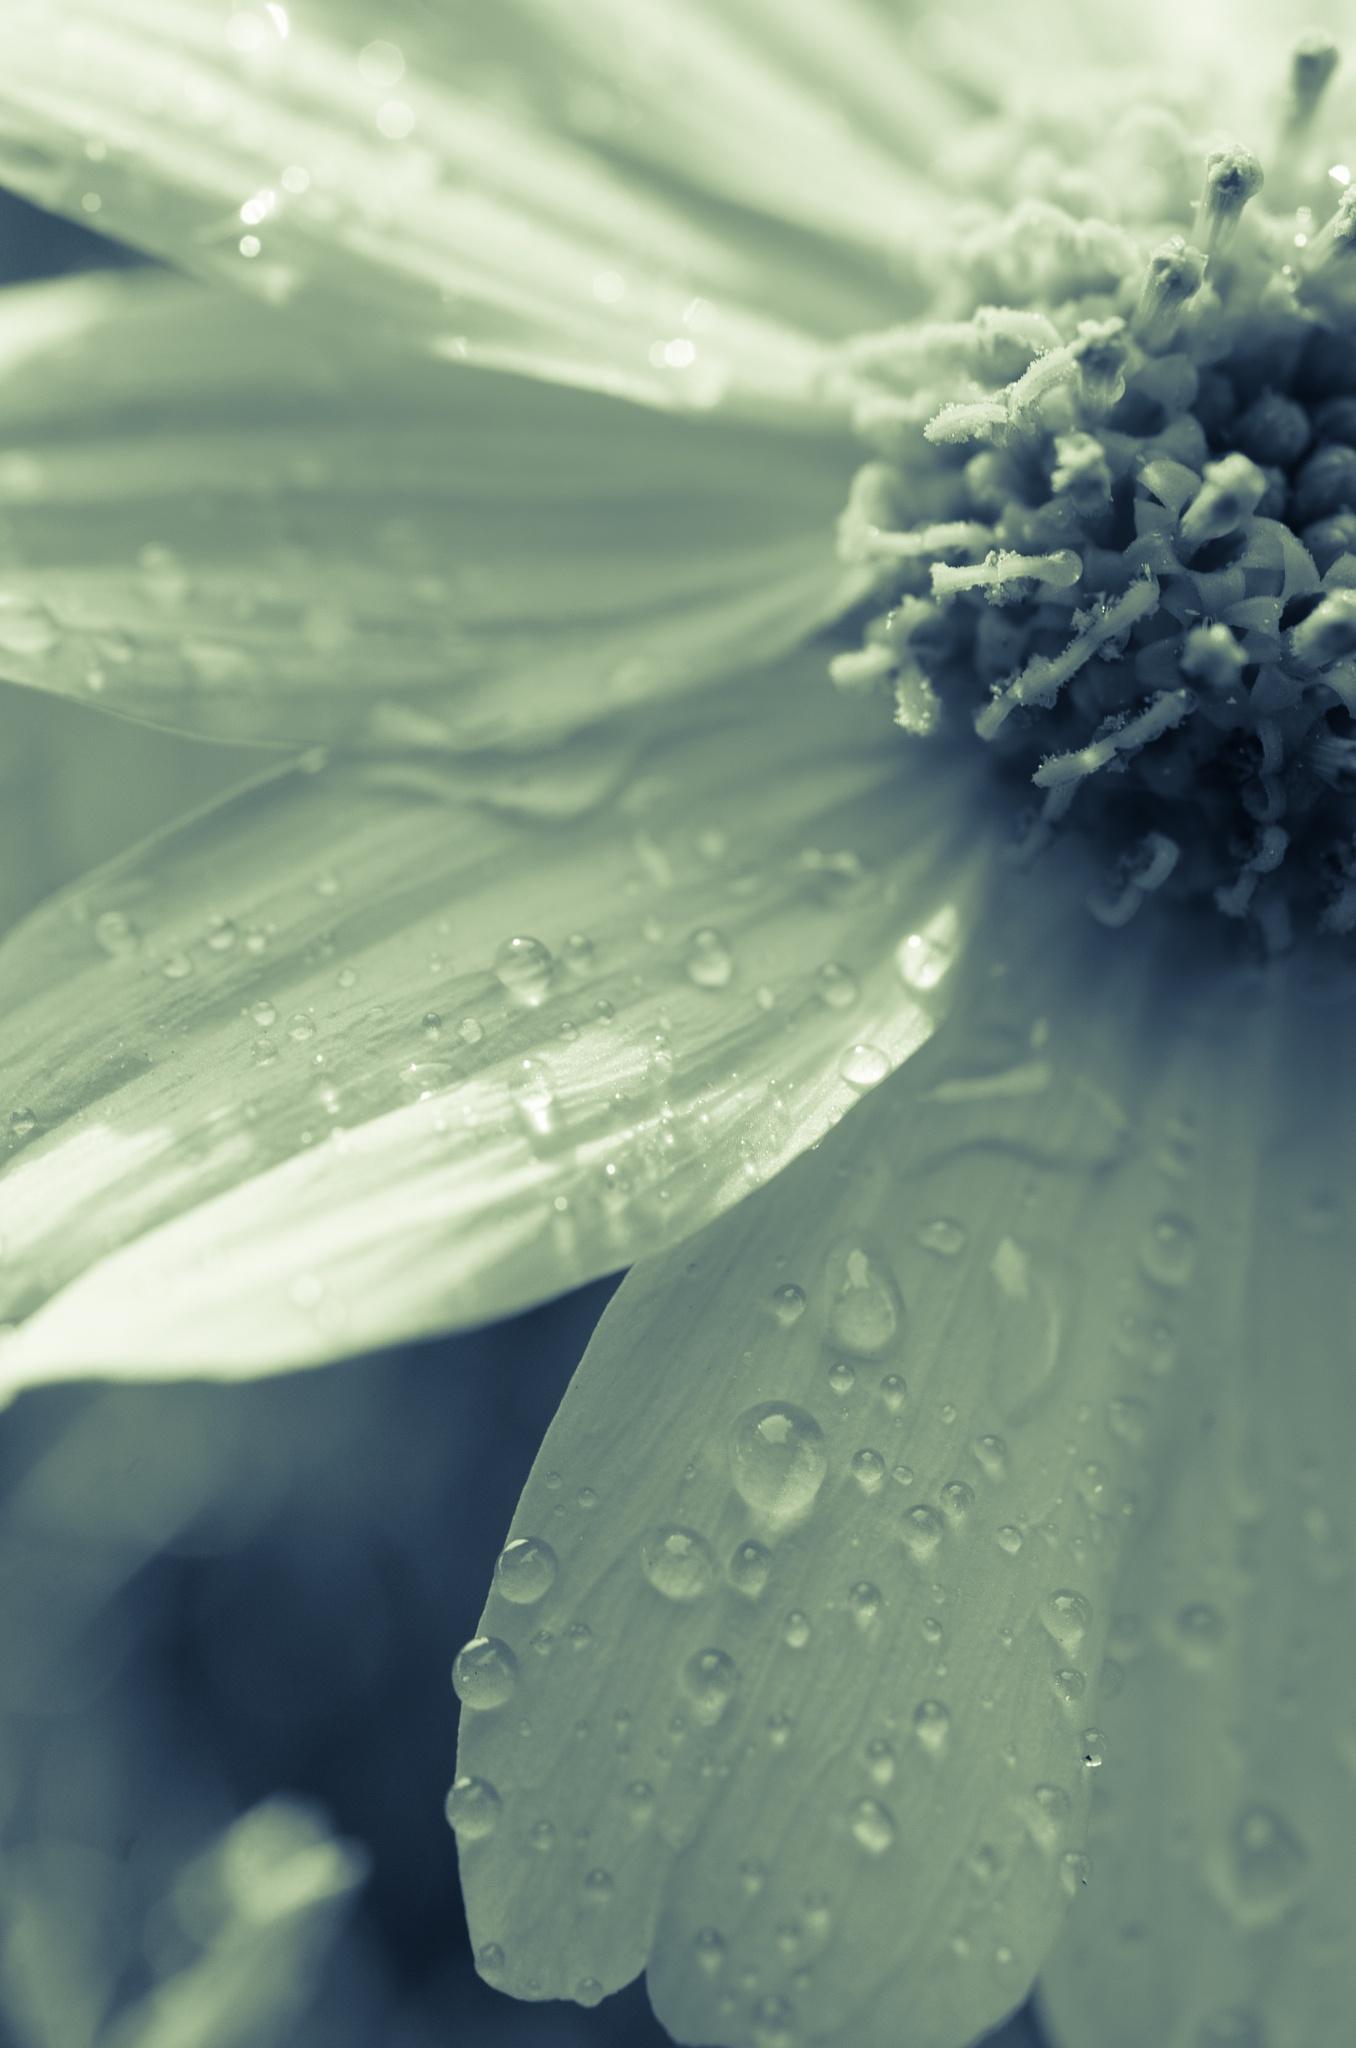 Rain and Flower by davidpinter